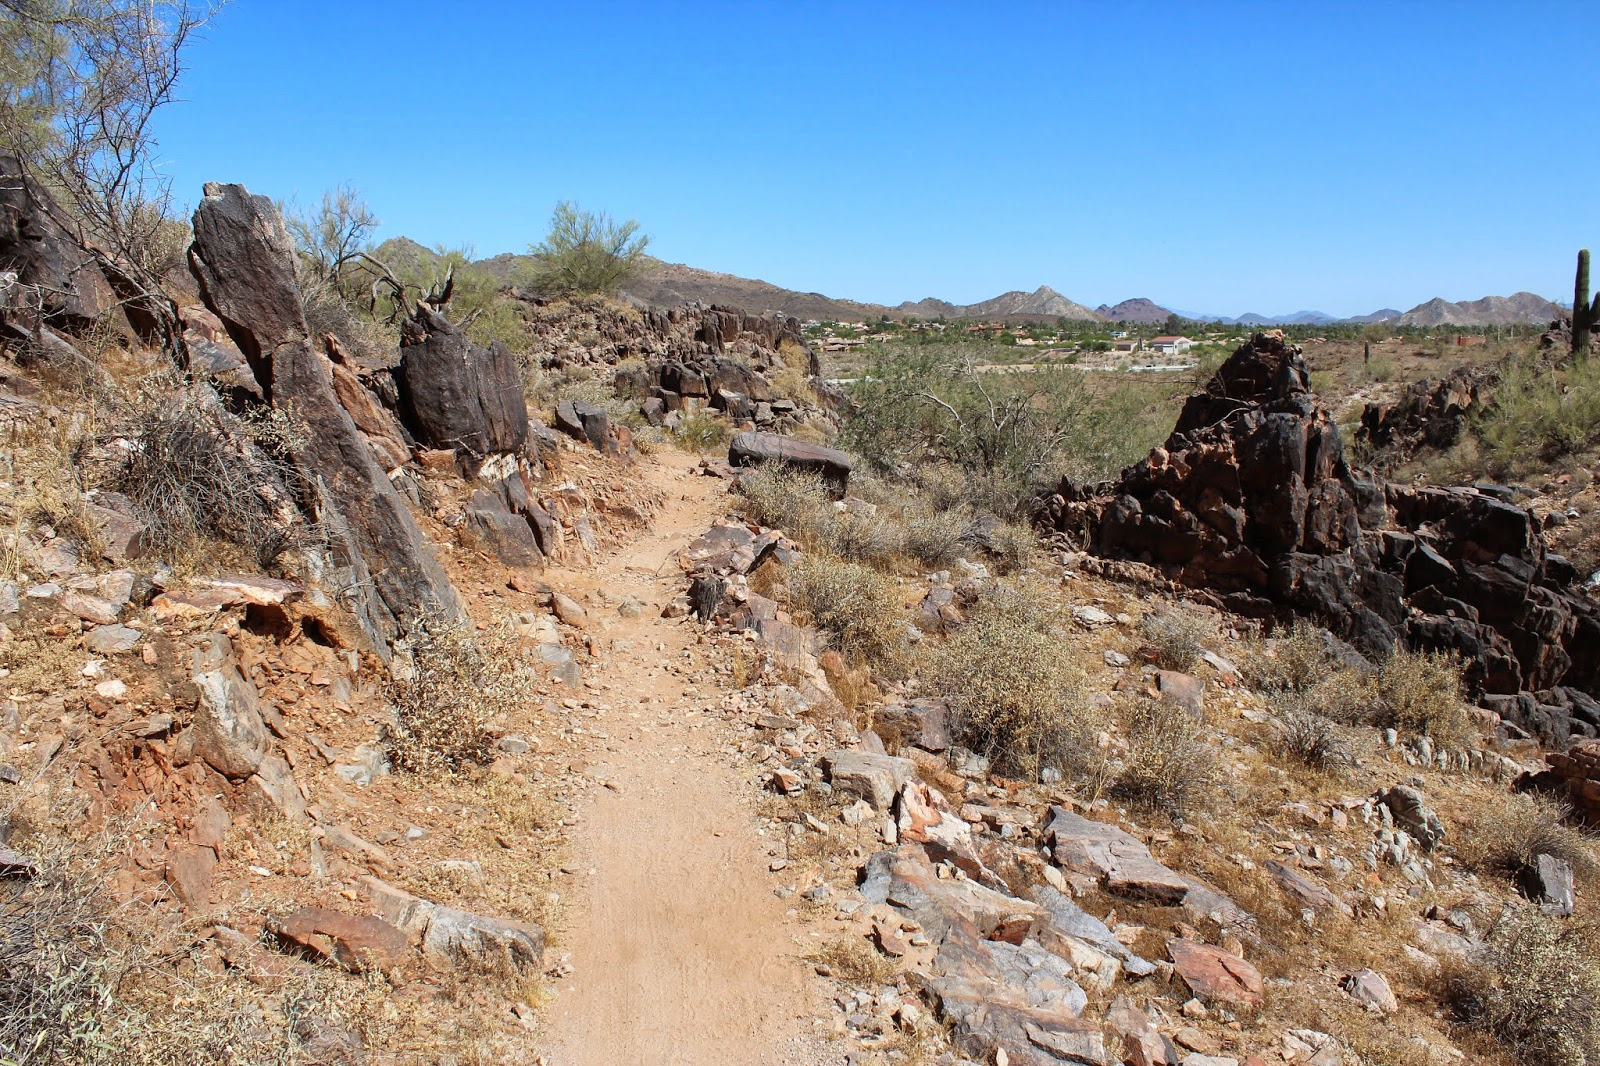 Gjhikes Com Dreamy Draw Nature Trail